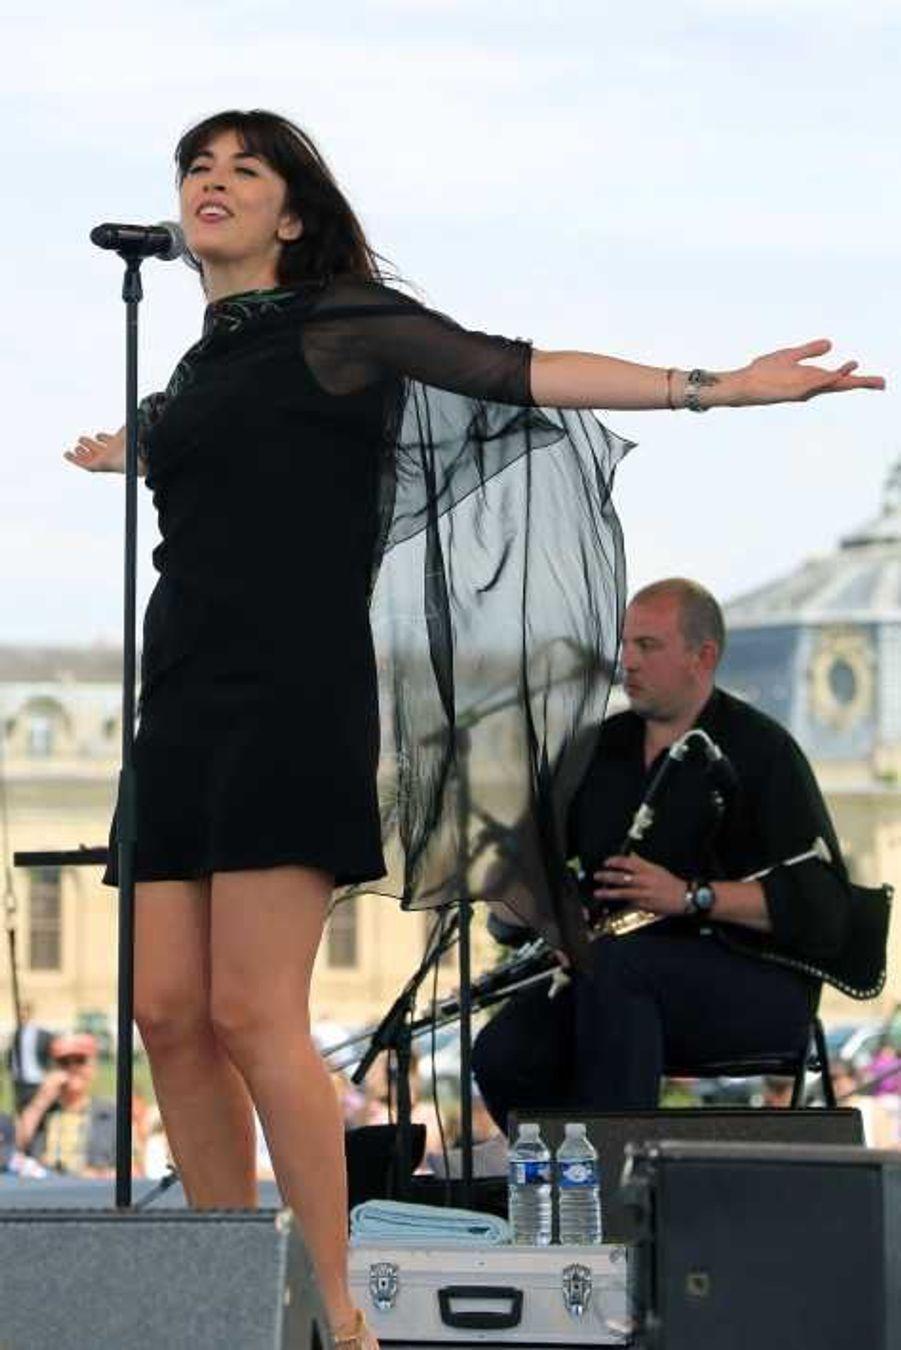 La chanteuse en plein show